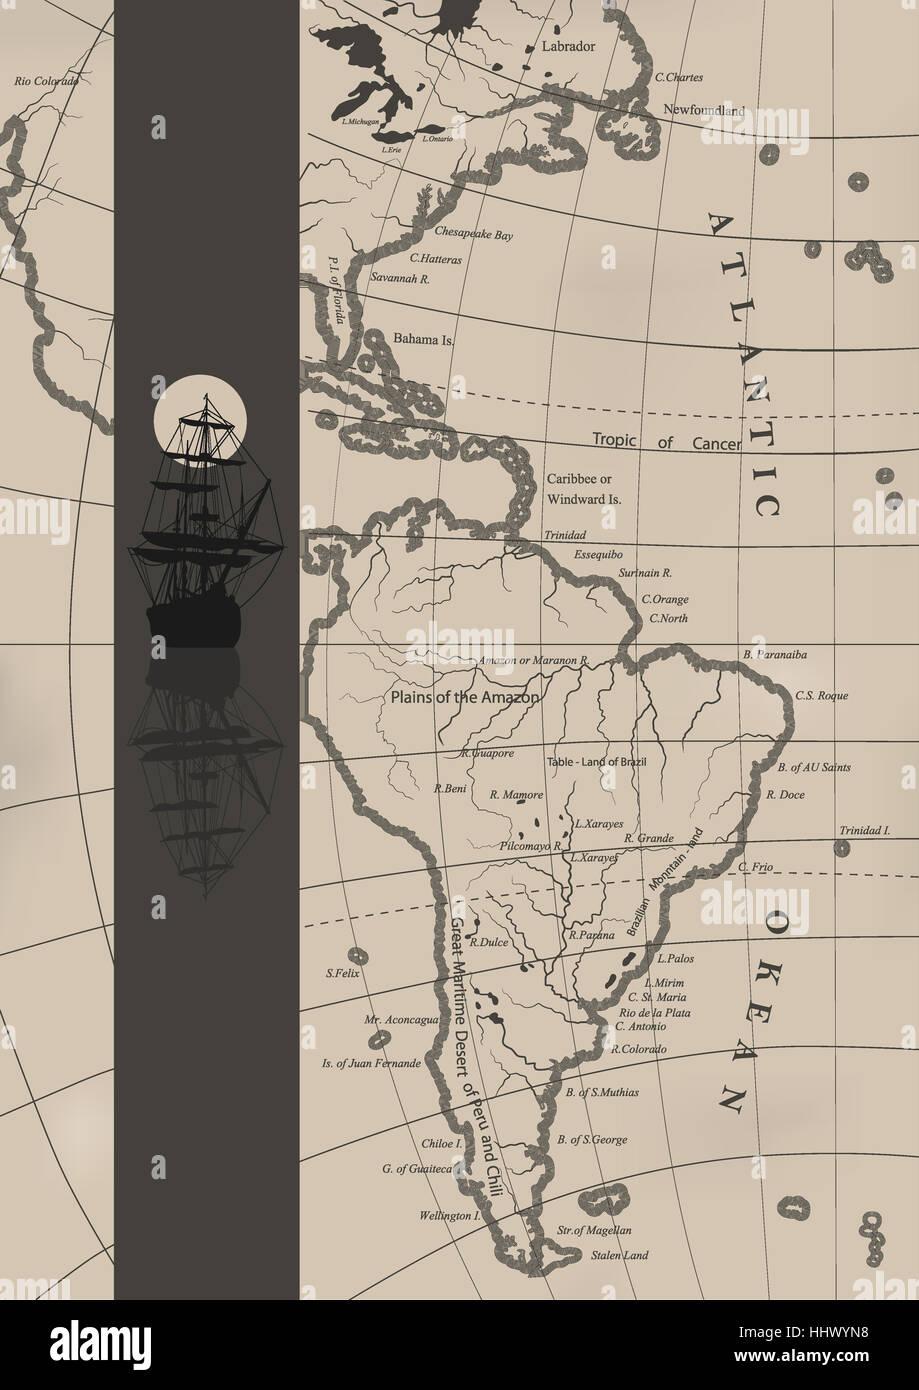 The old sea charts and a sailing ship. - Stock Image